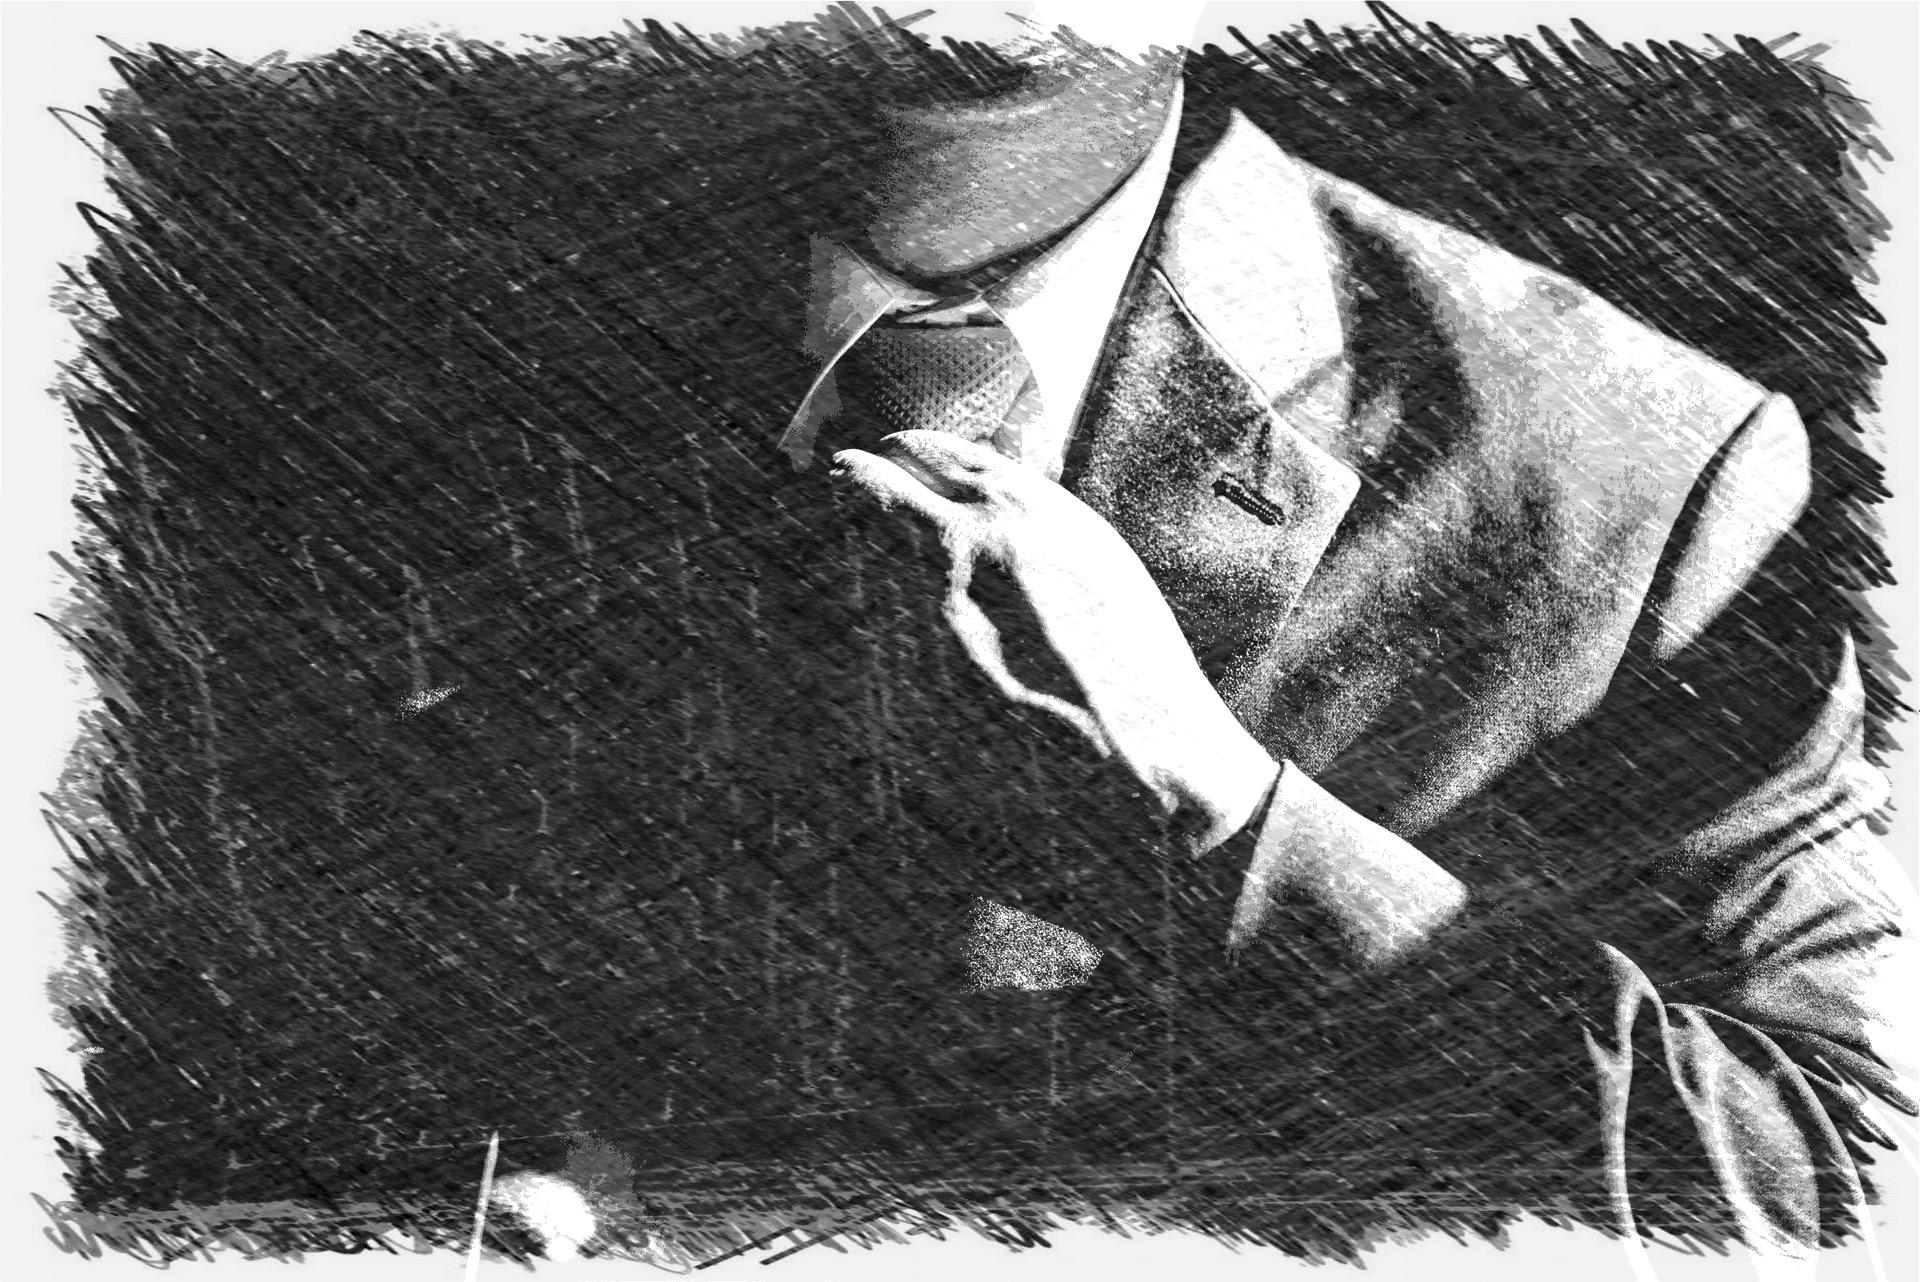 Projekt Black Hungarian - Dominik - Romanfigur